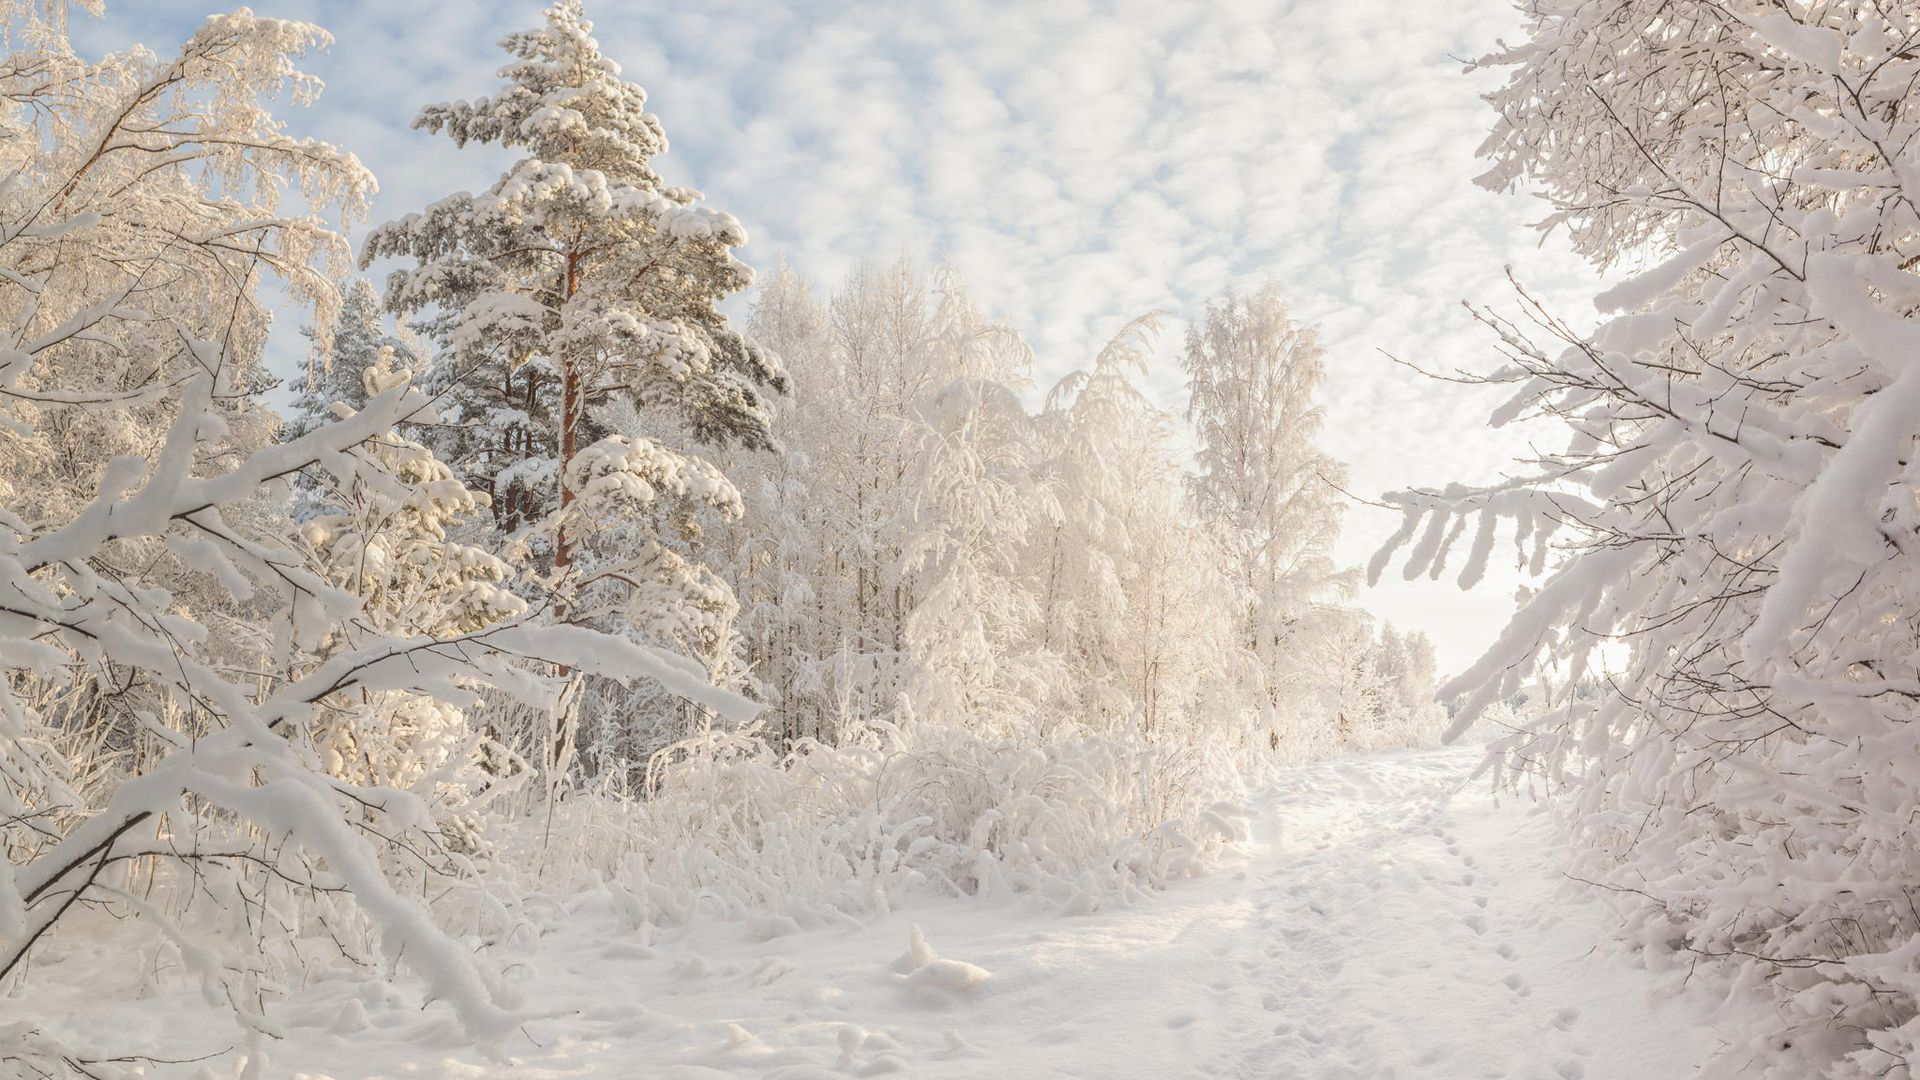 Beautiful Snowy Russian Winter Hd Wallpapers Volganga Winter Landscape Winter Pictures Winter Photos